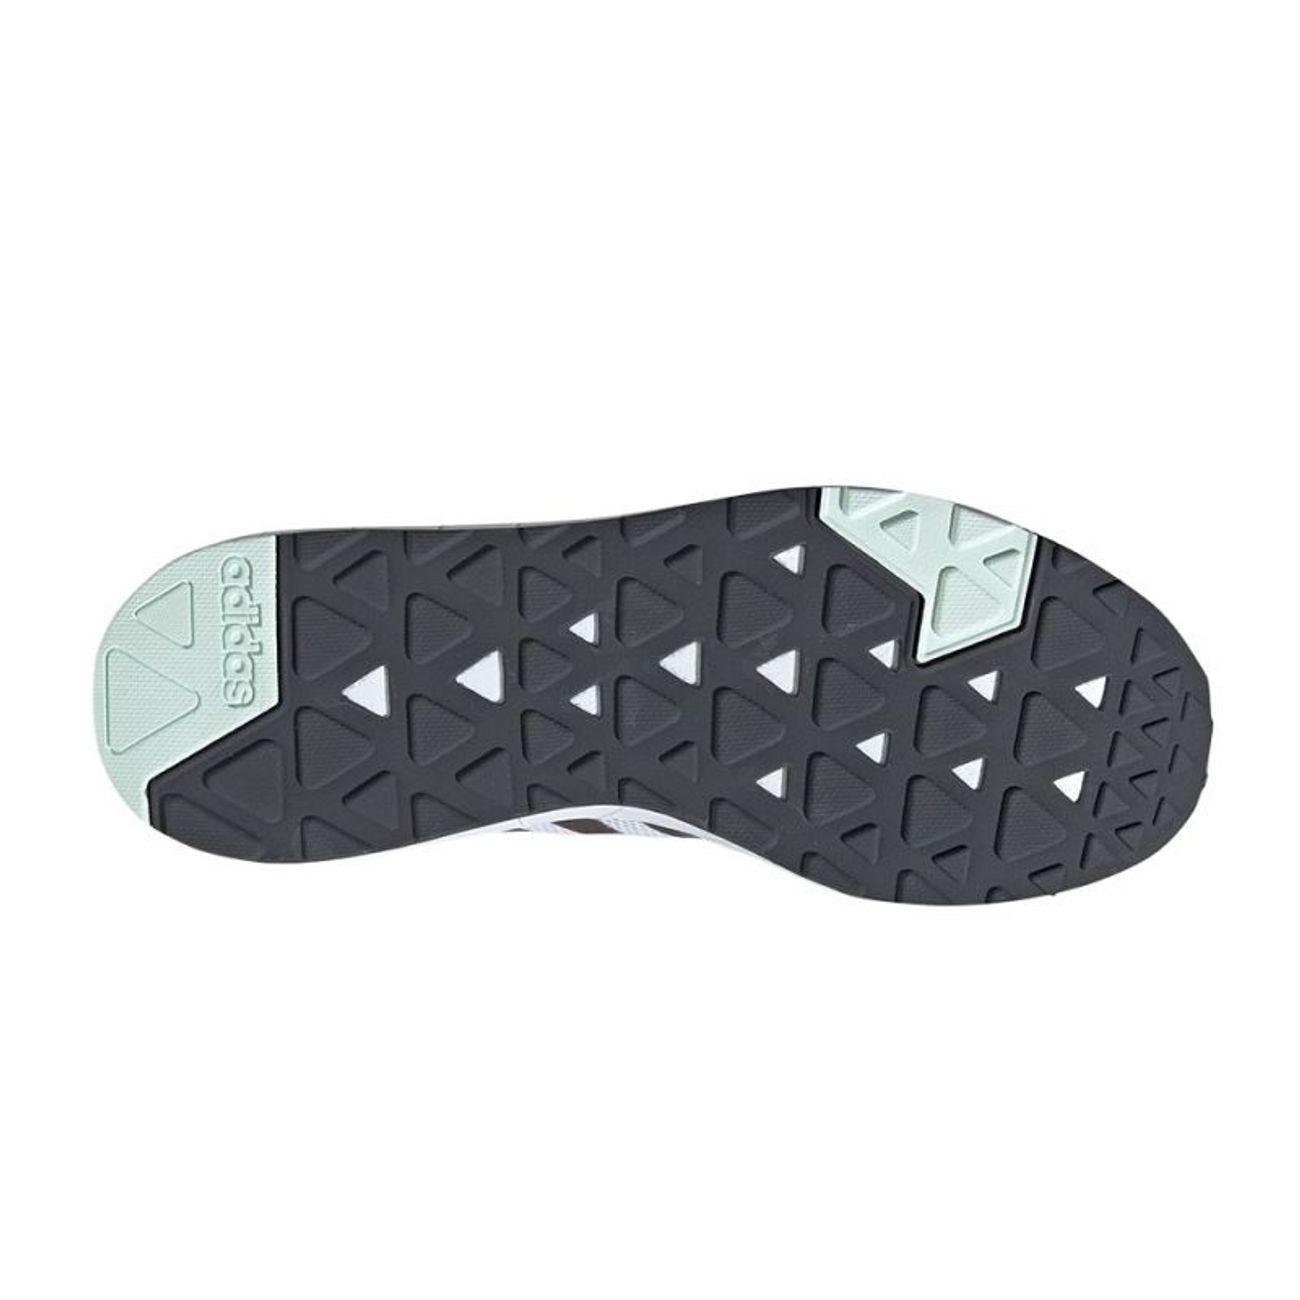 Mujer Blanco Khoe F97195 Padel Negro Adidas Adulte Run 5RjL4A